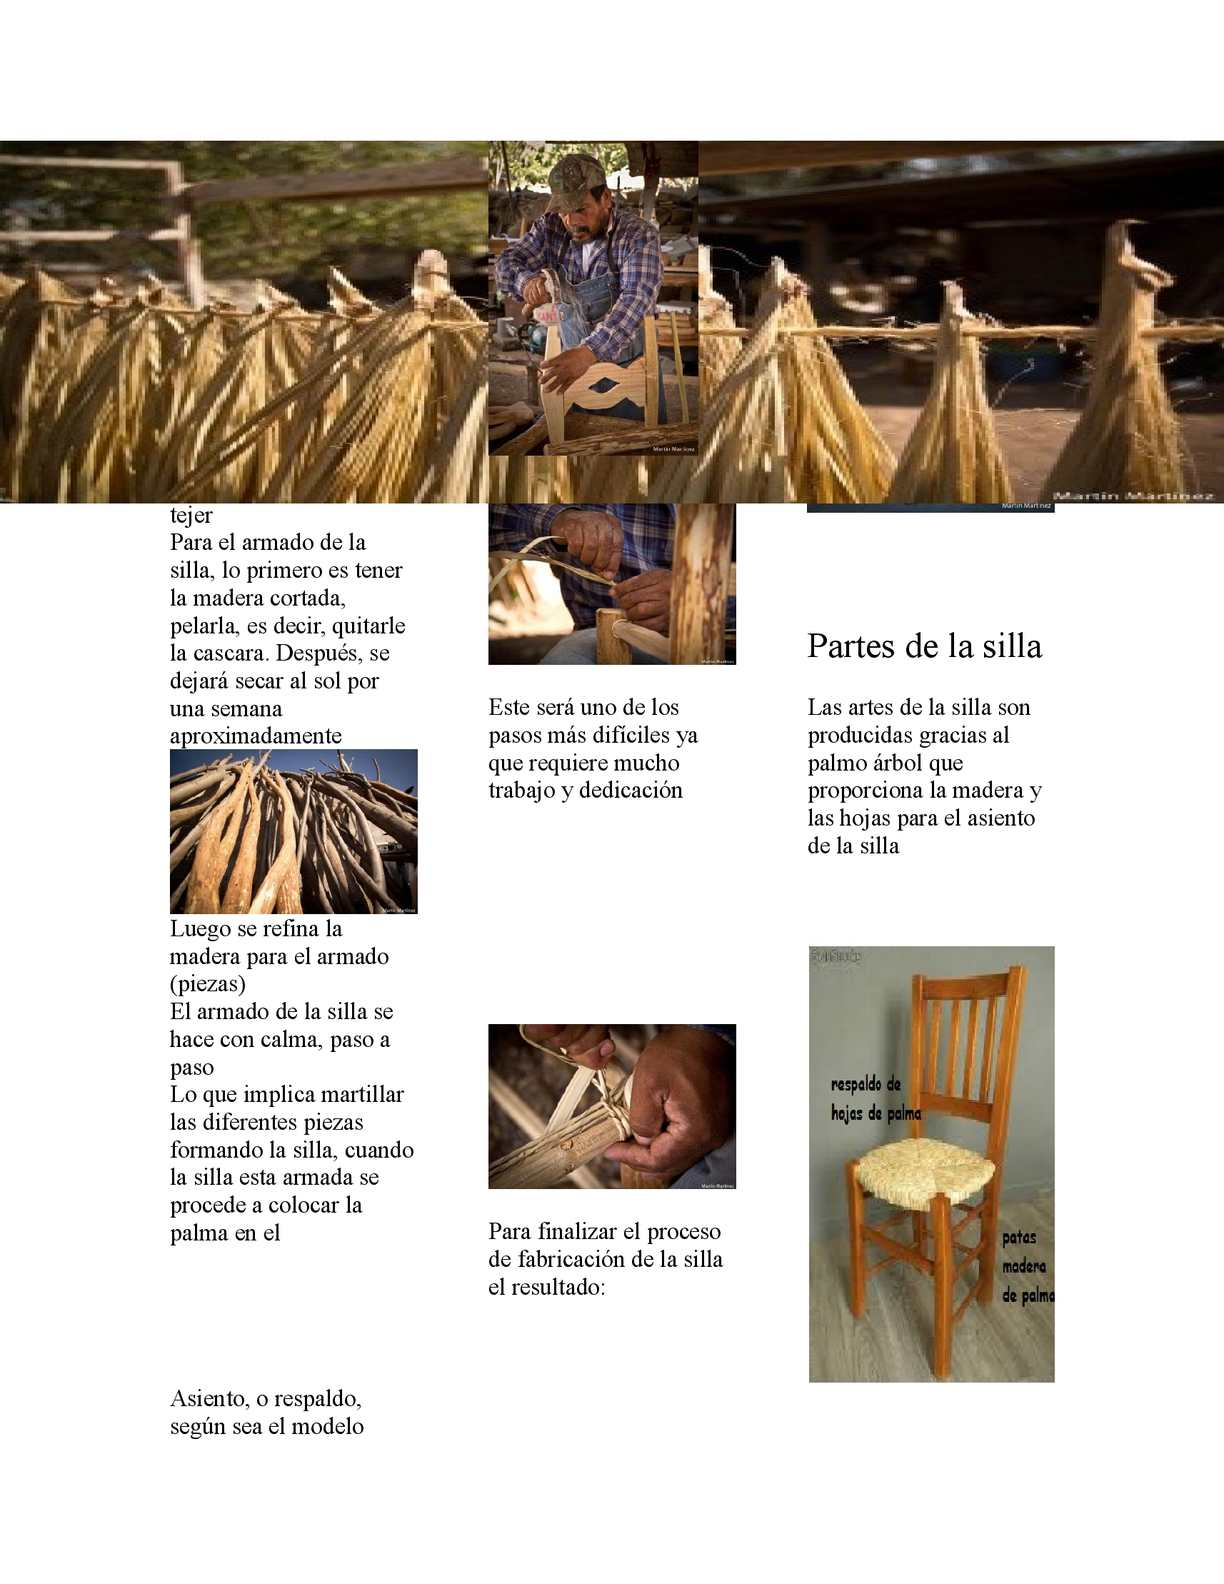 Calaméo - fabricacion de sillas artesanal